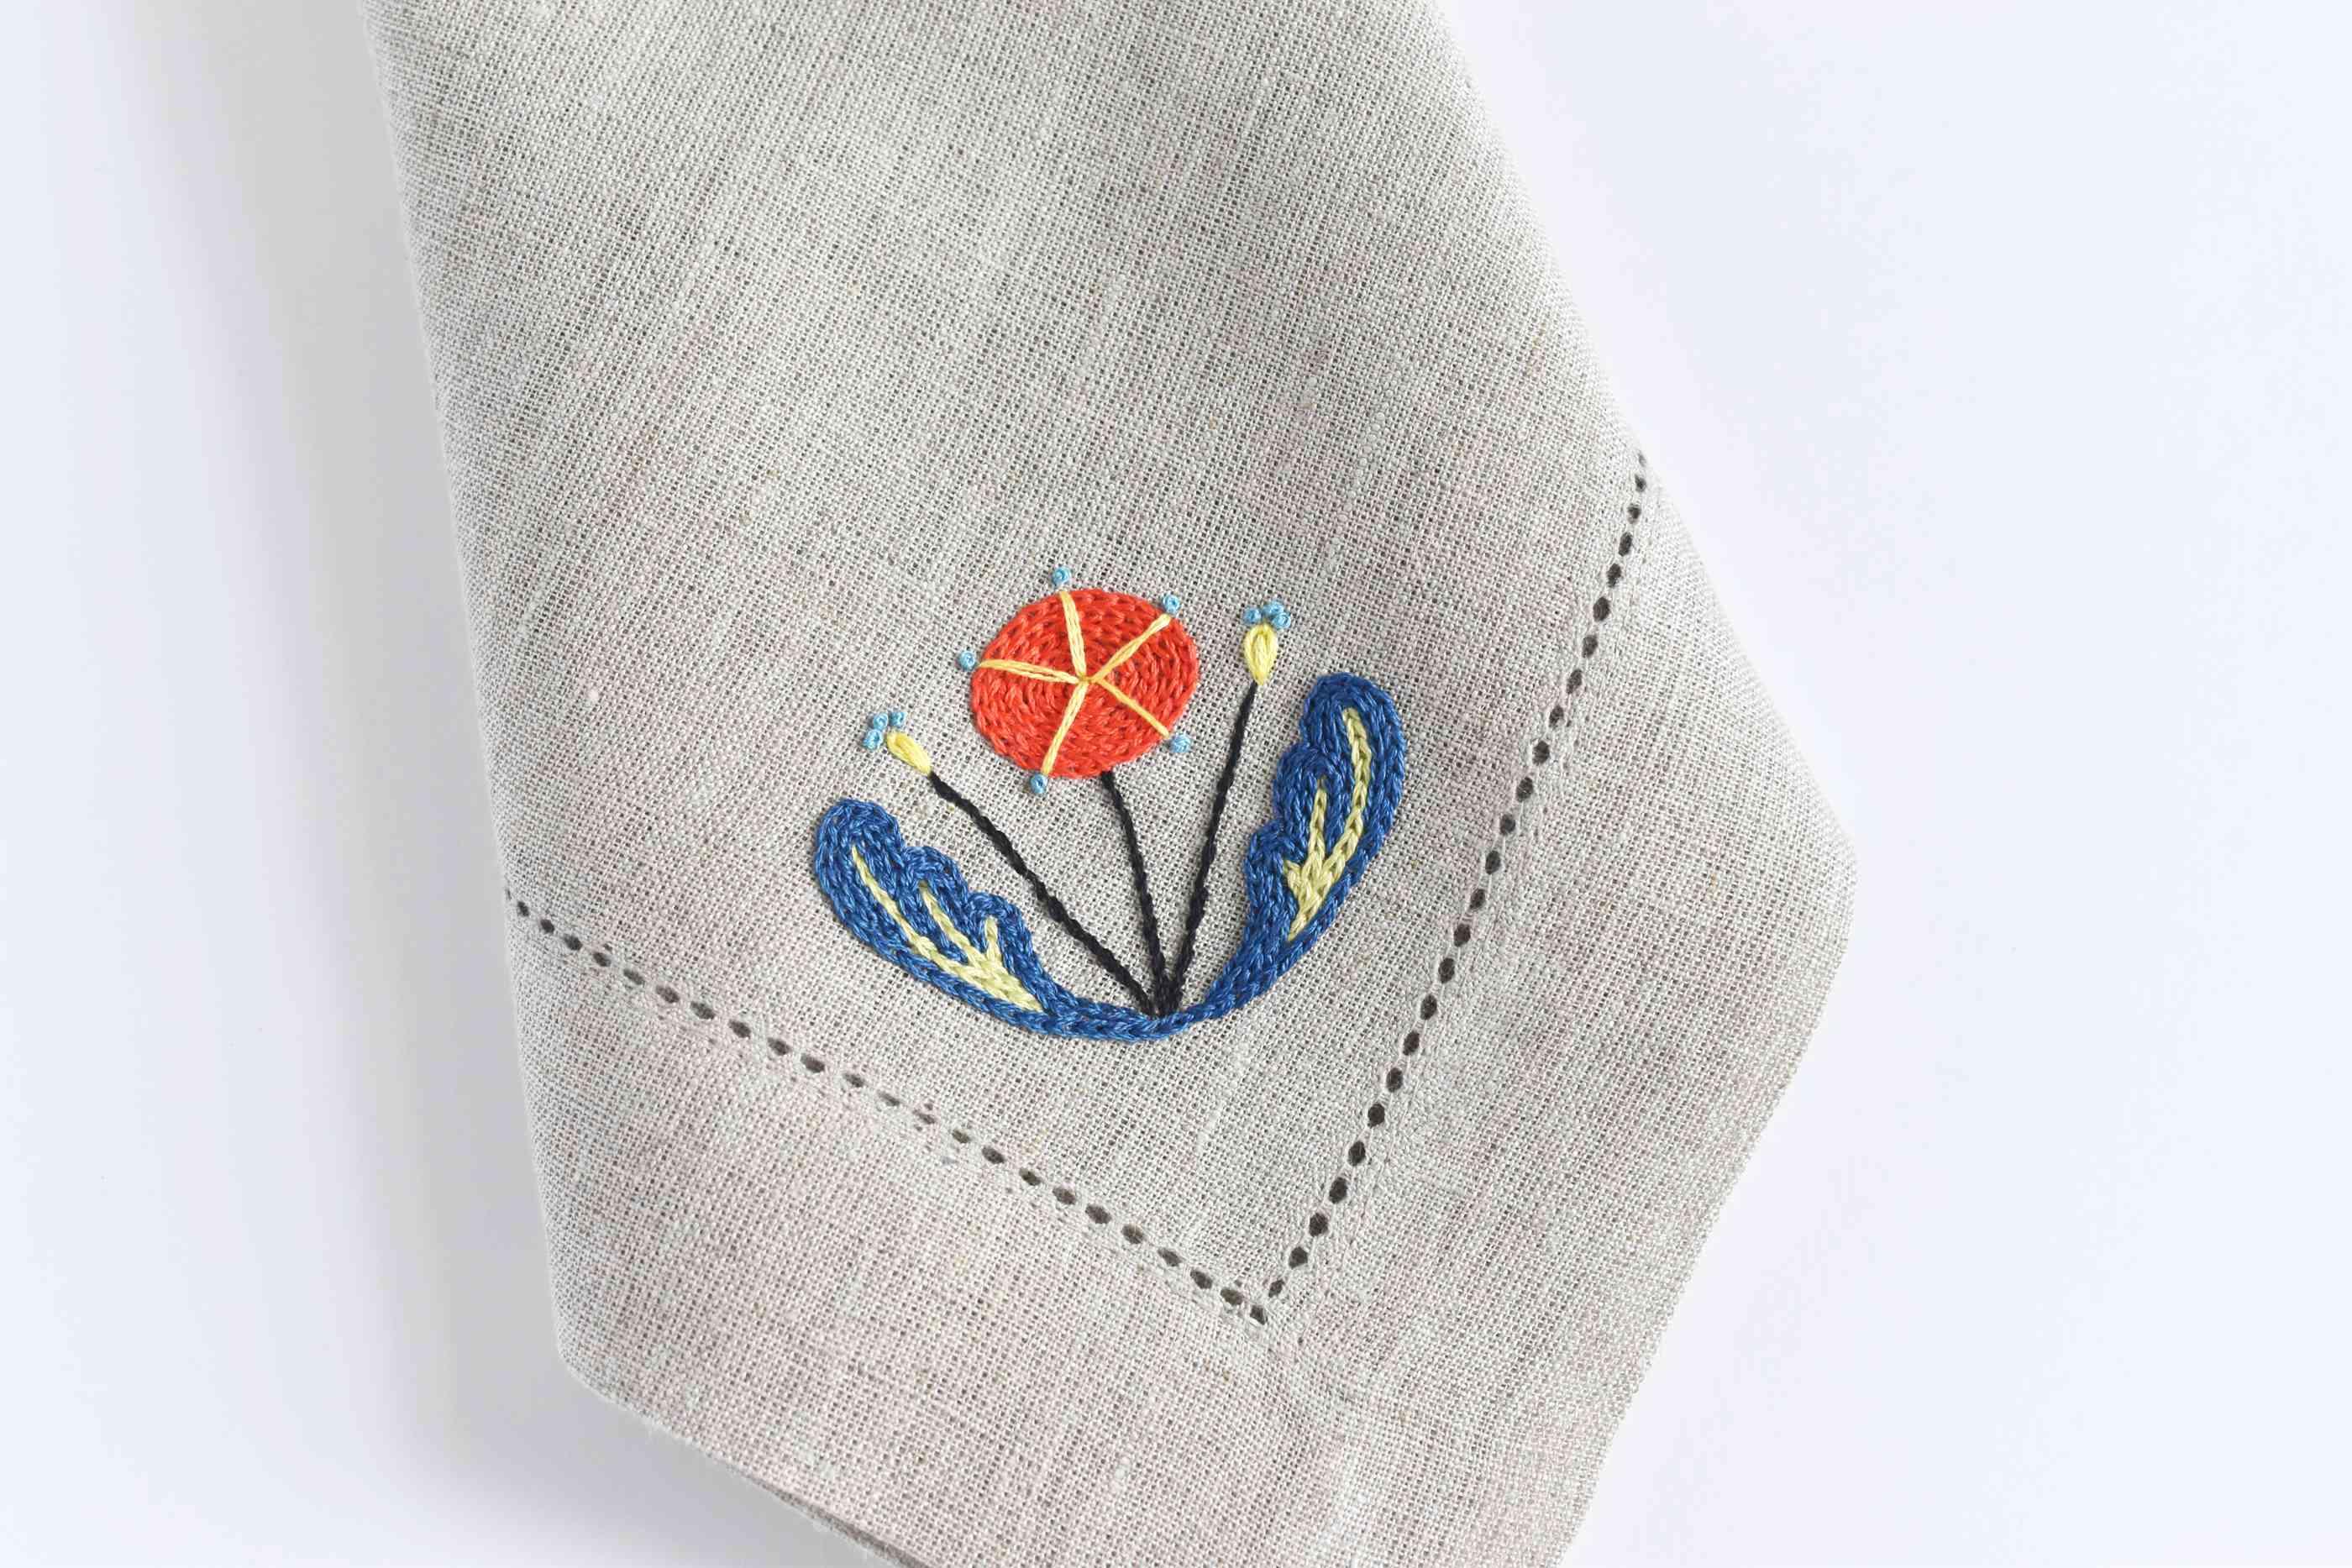 Scandinavian flower embroidered onto a napkin